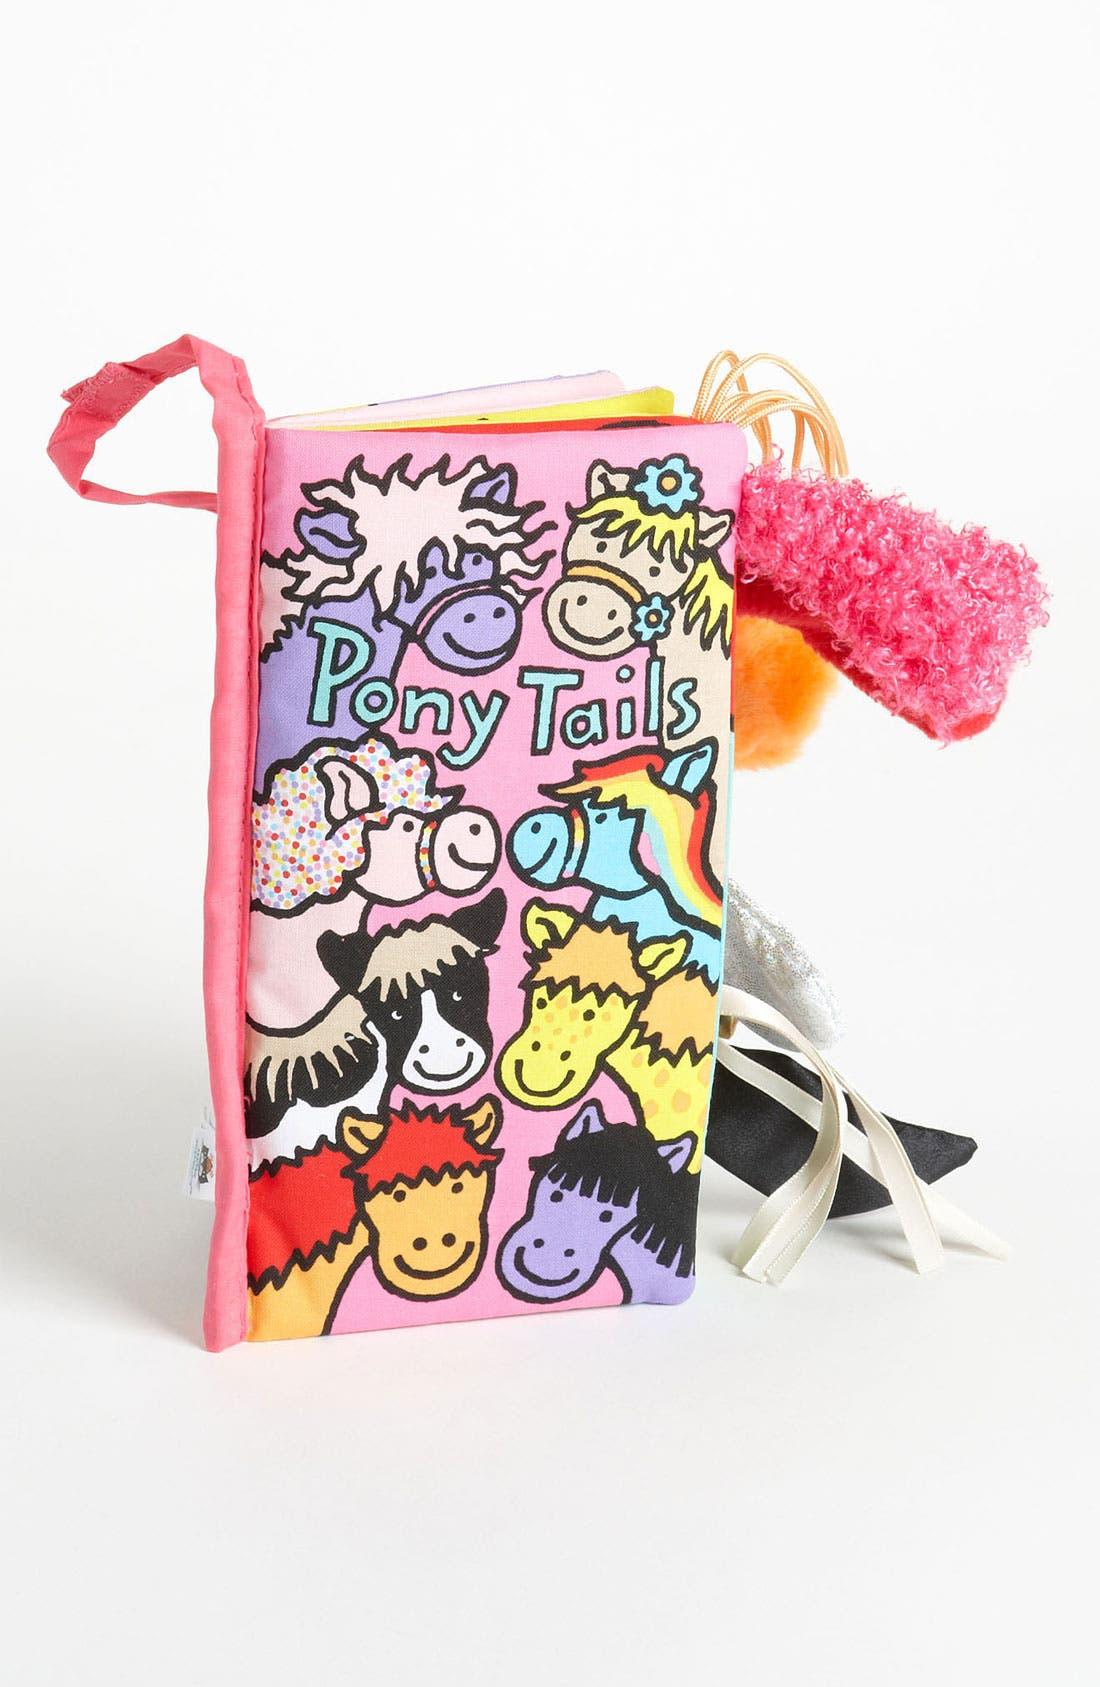 'Pony Tails' Book